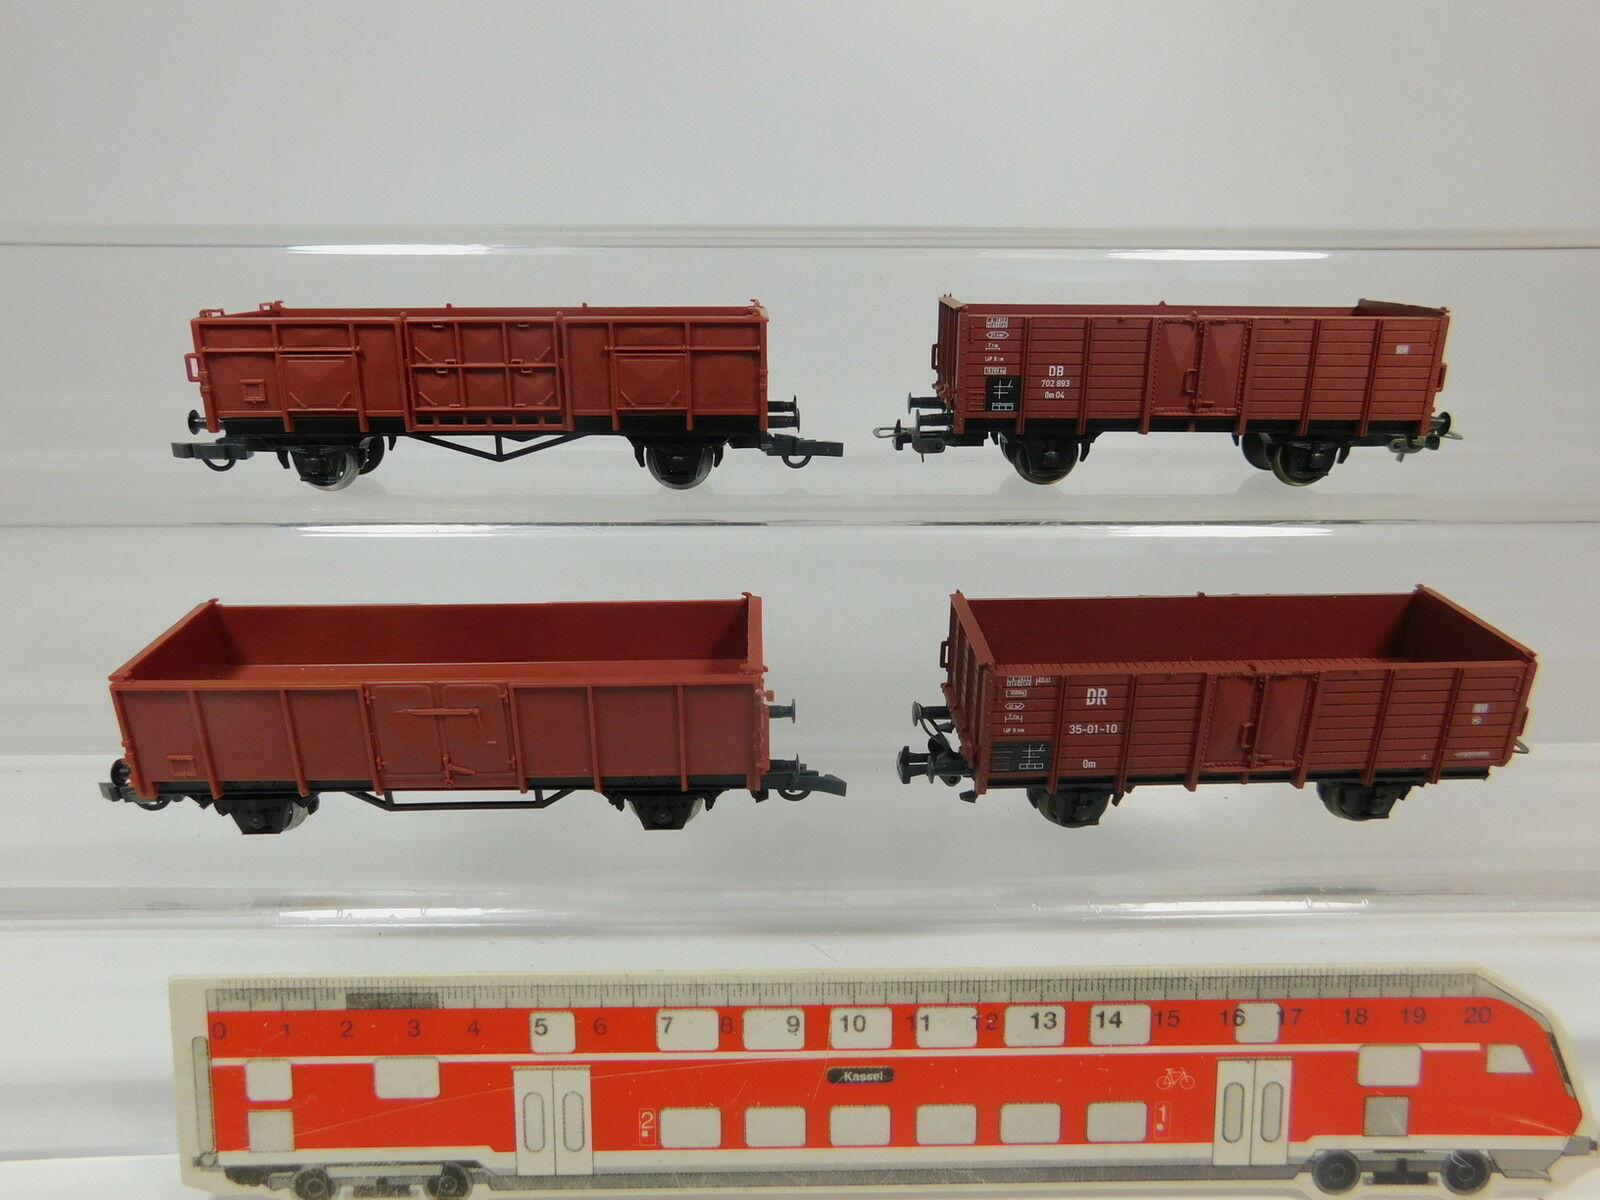 AQ891-1x Piko H0 DC Güterwagen NEM  35-01-10 DR+702 893 Om 04 DB etc